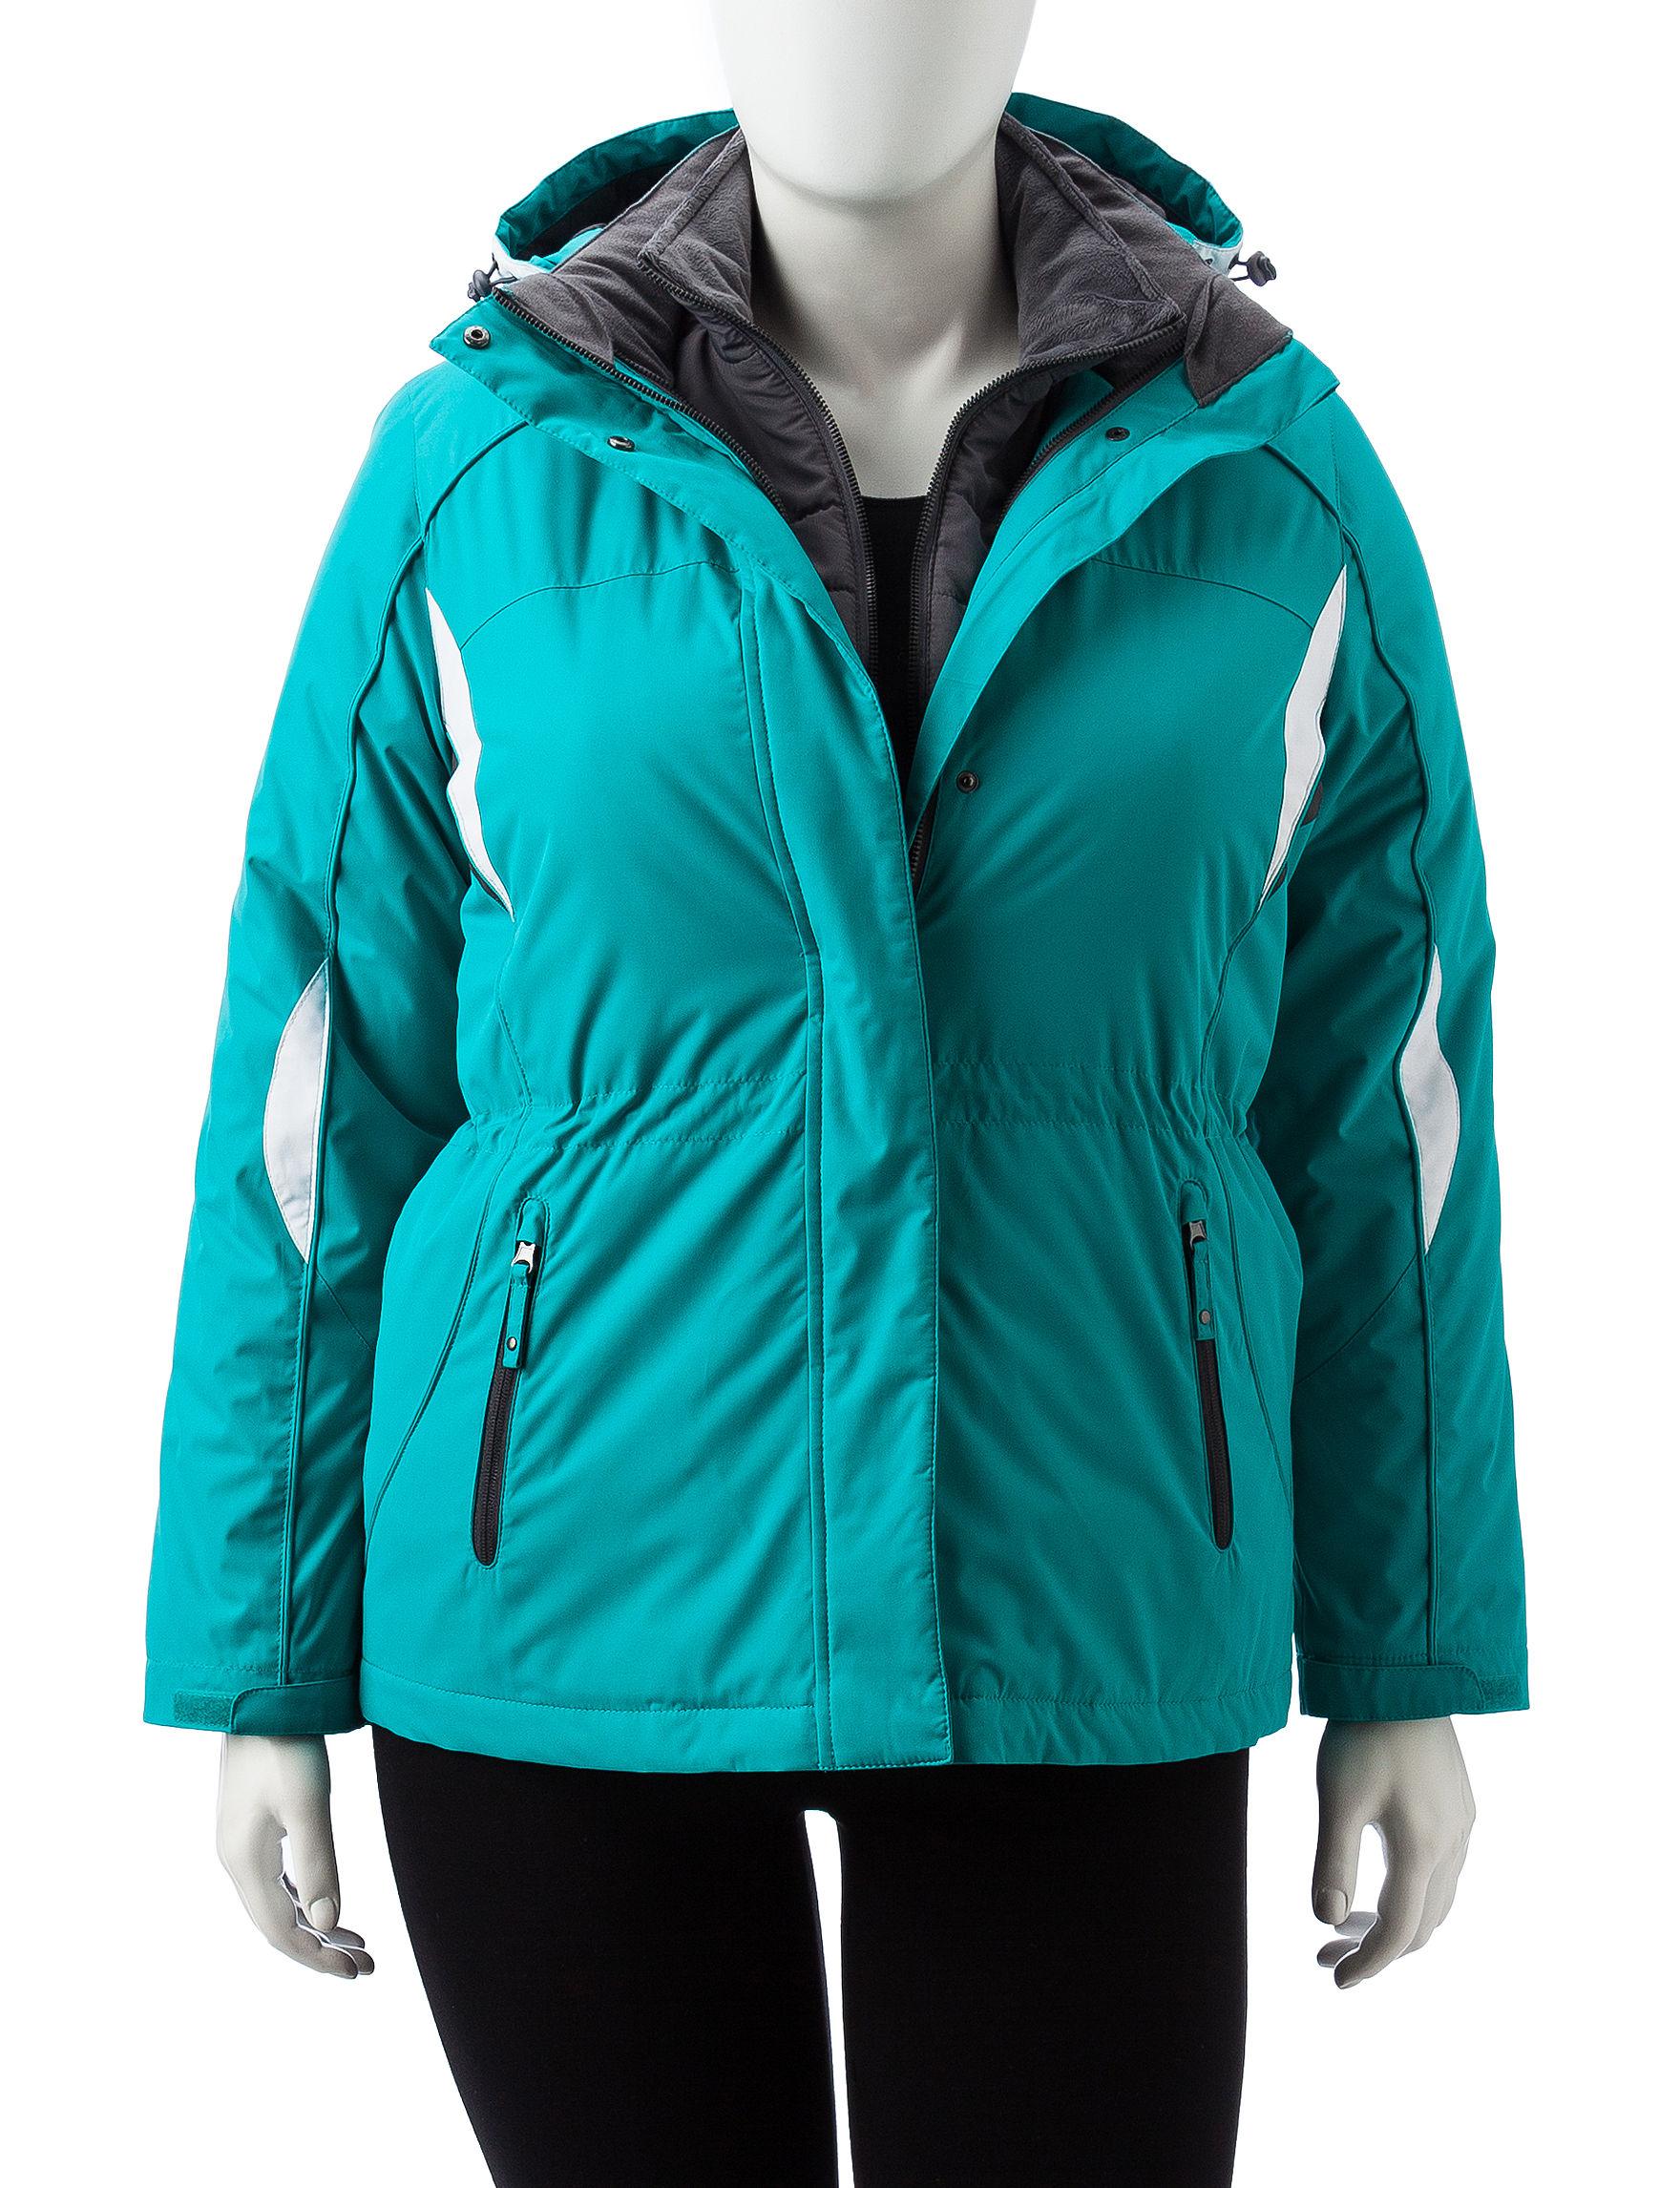 Below Zero Green Rain & Snow Jackets